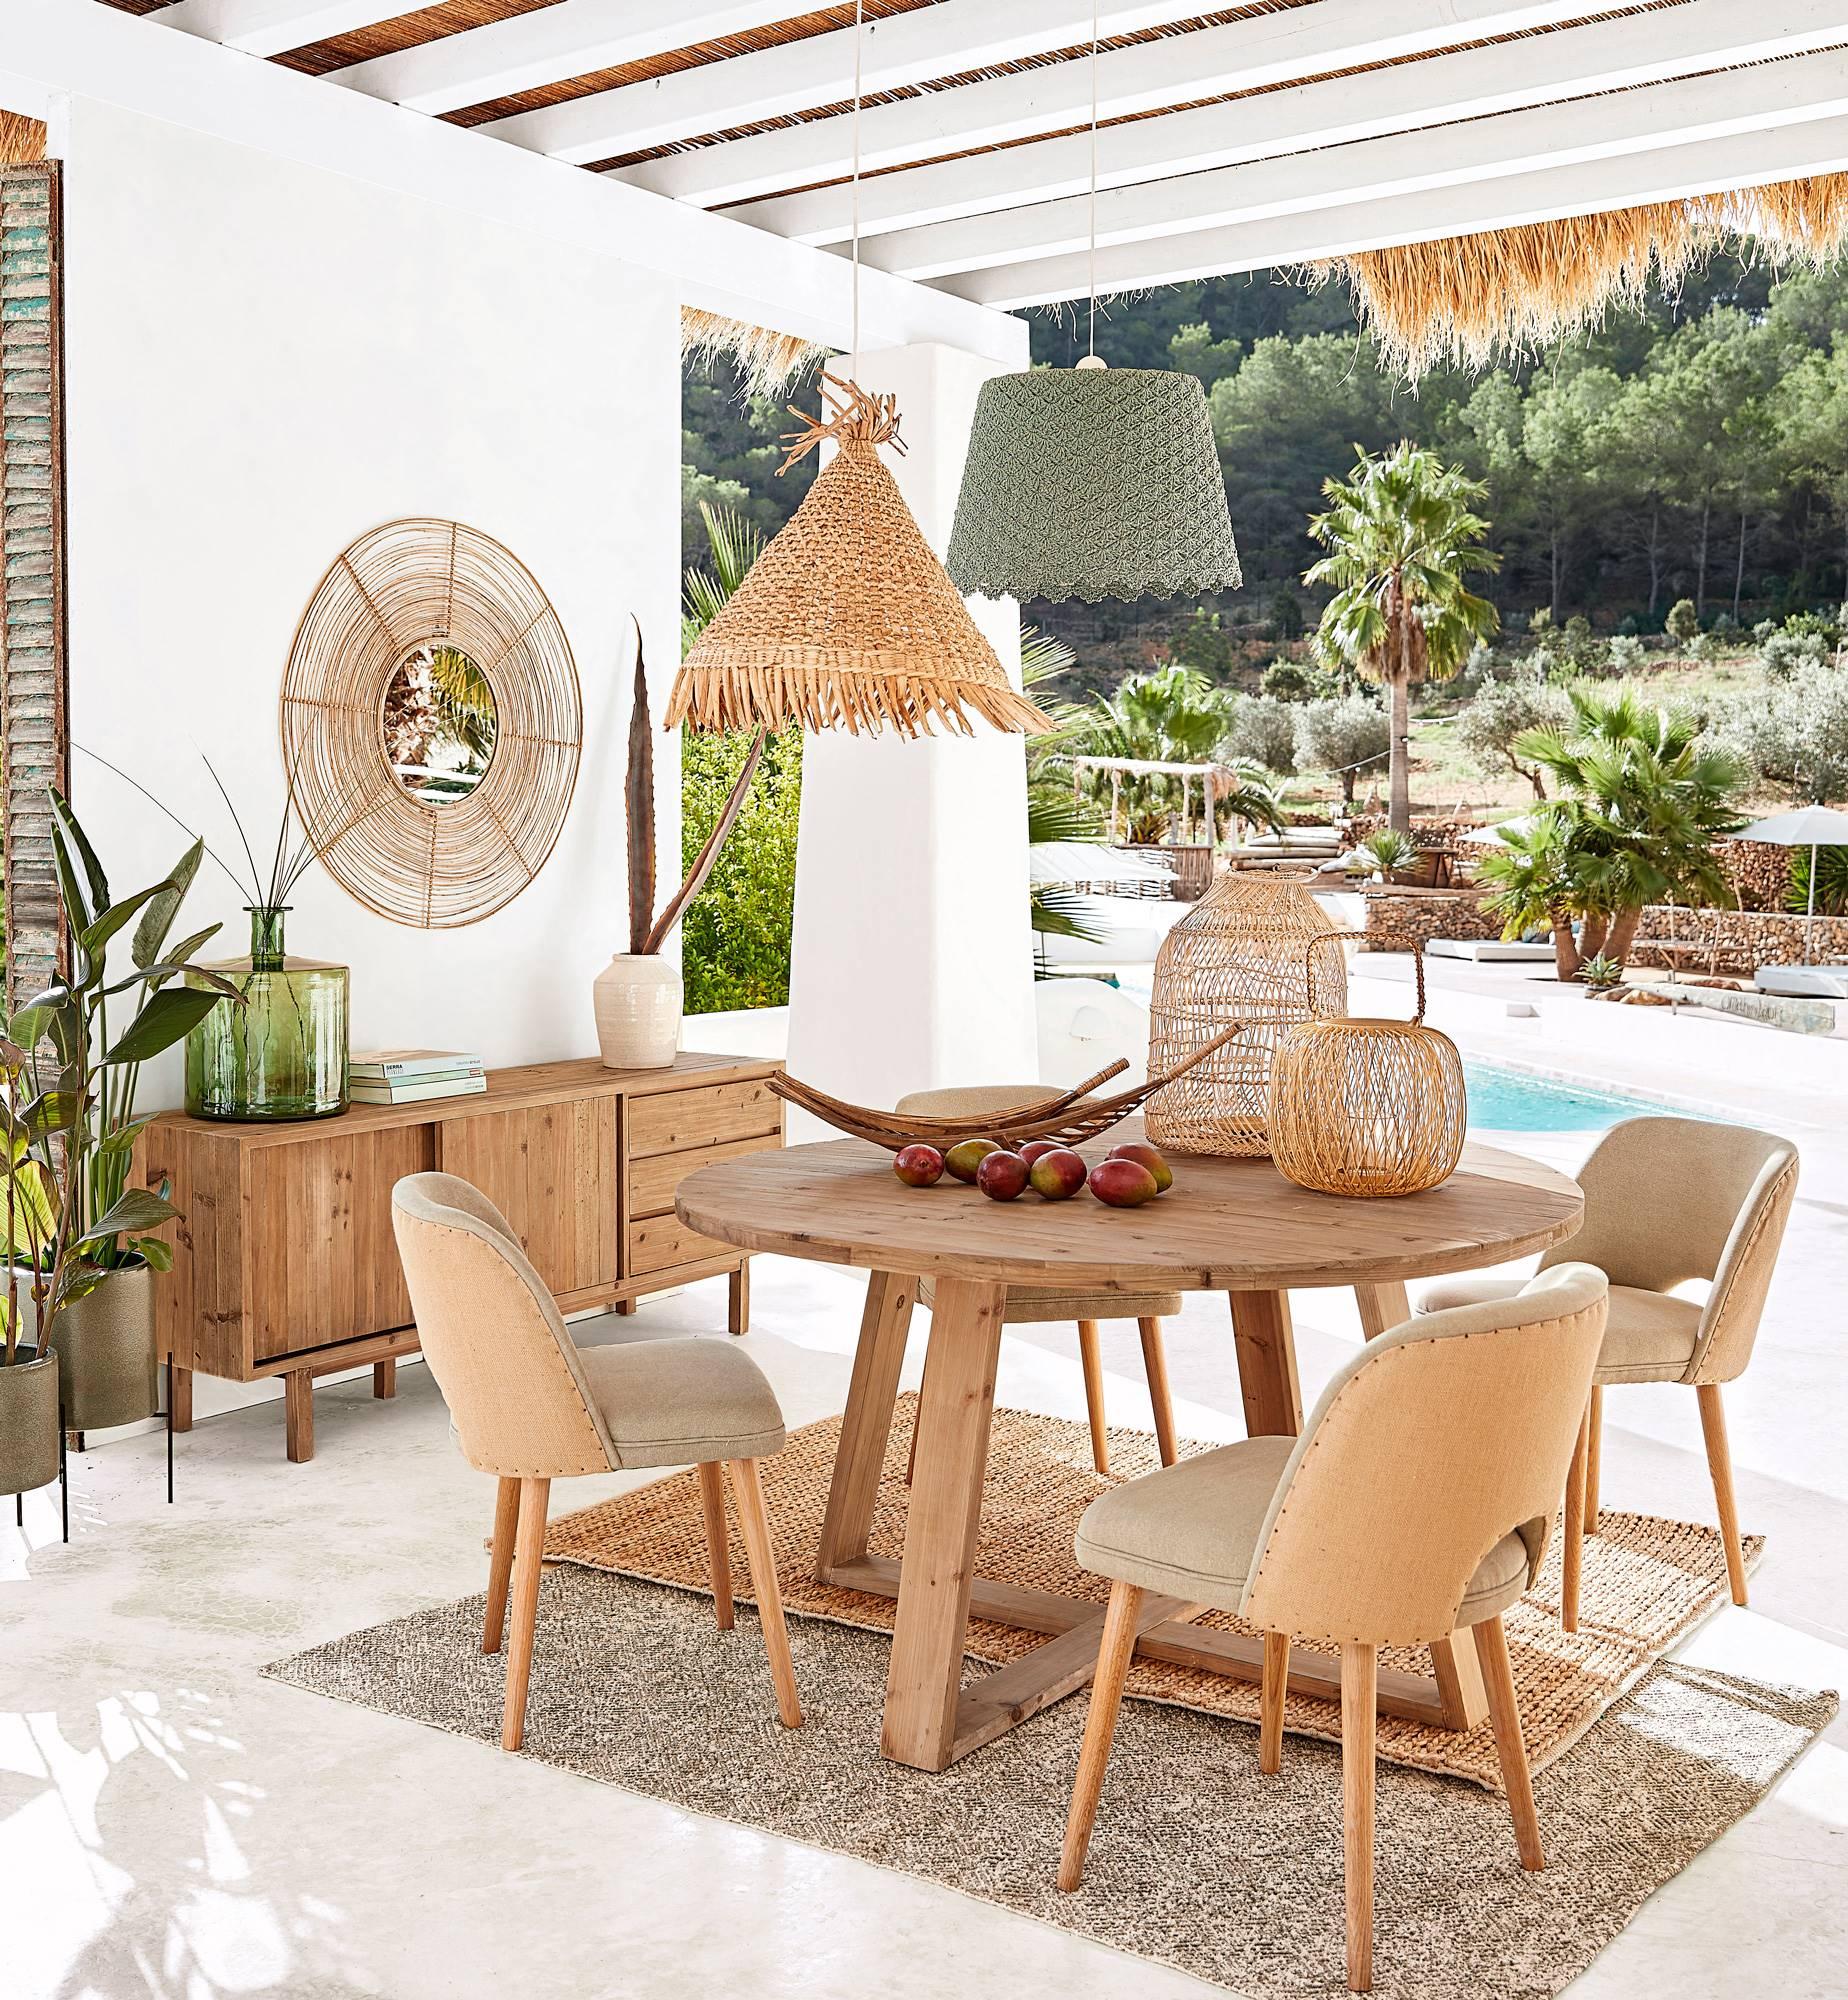 muebles para la primavera verano de maisons du monde. Black Bedroom Furniture Sets. Home Design Ideas